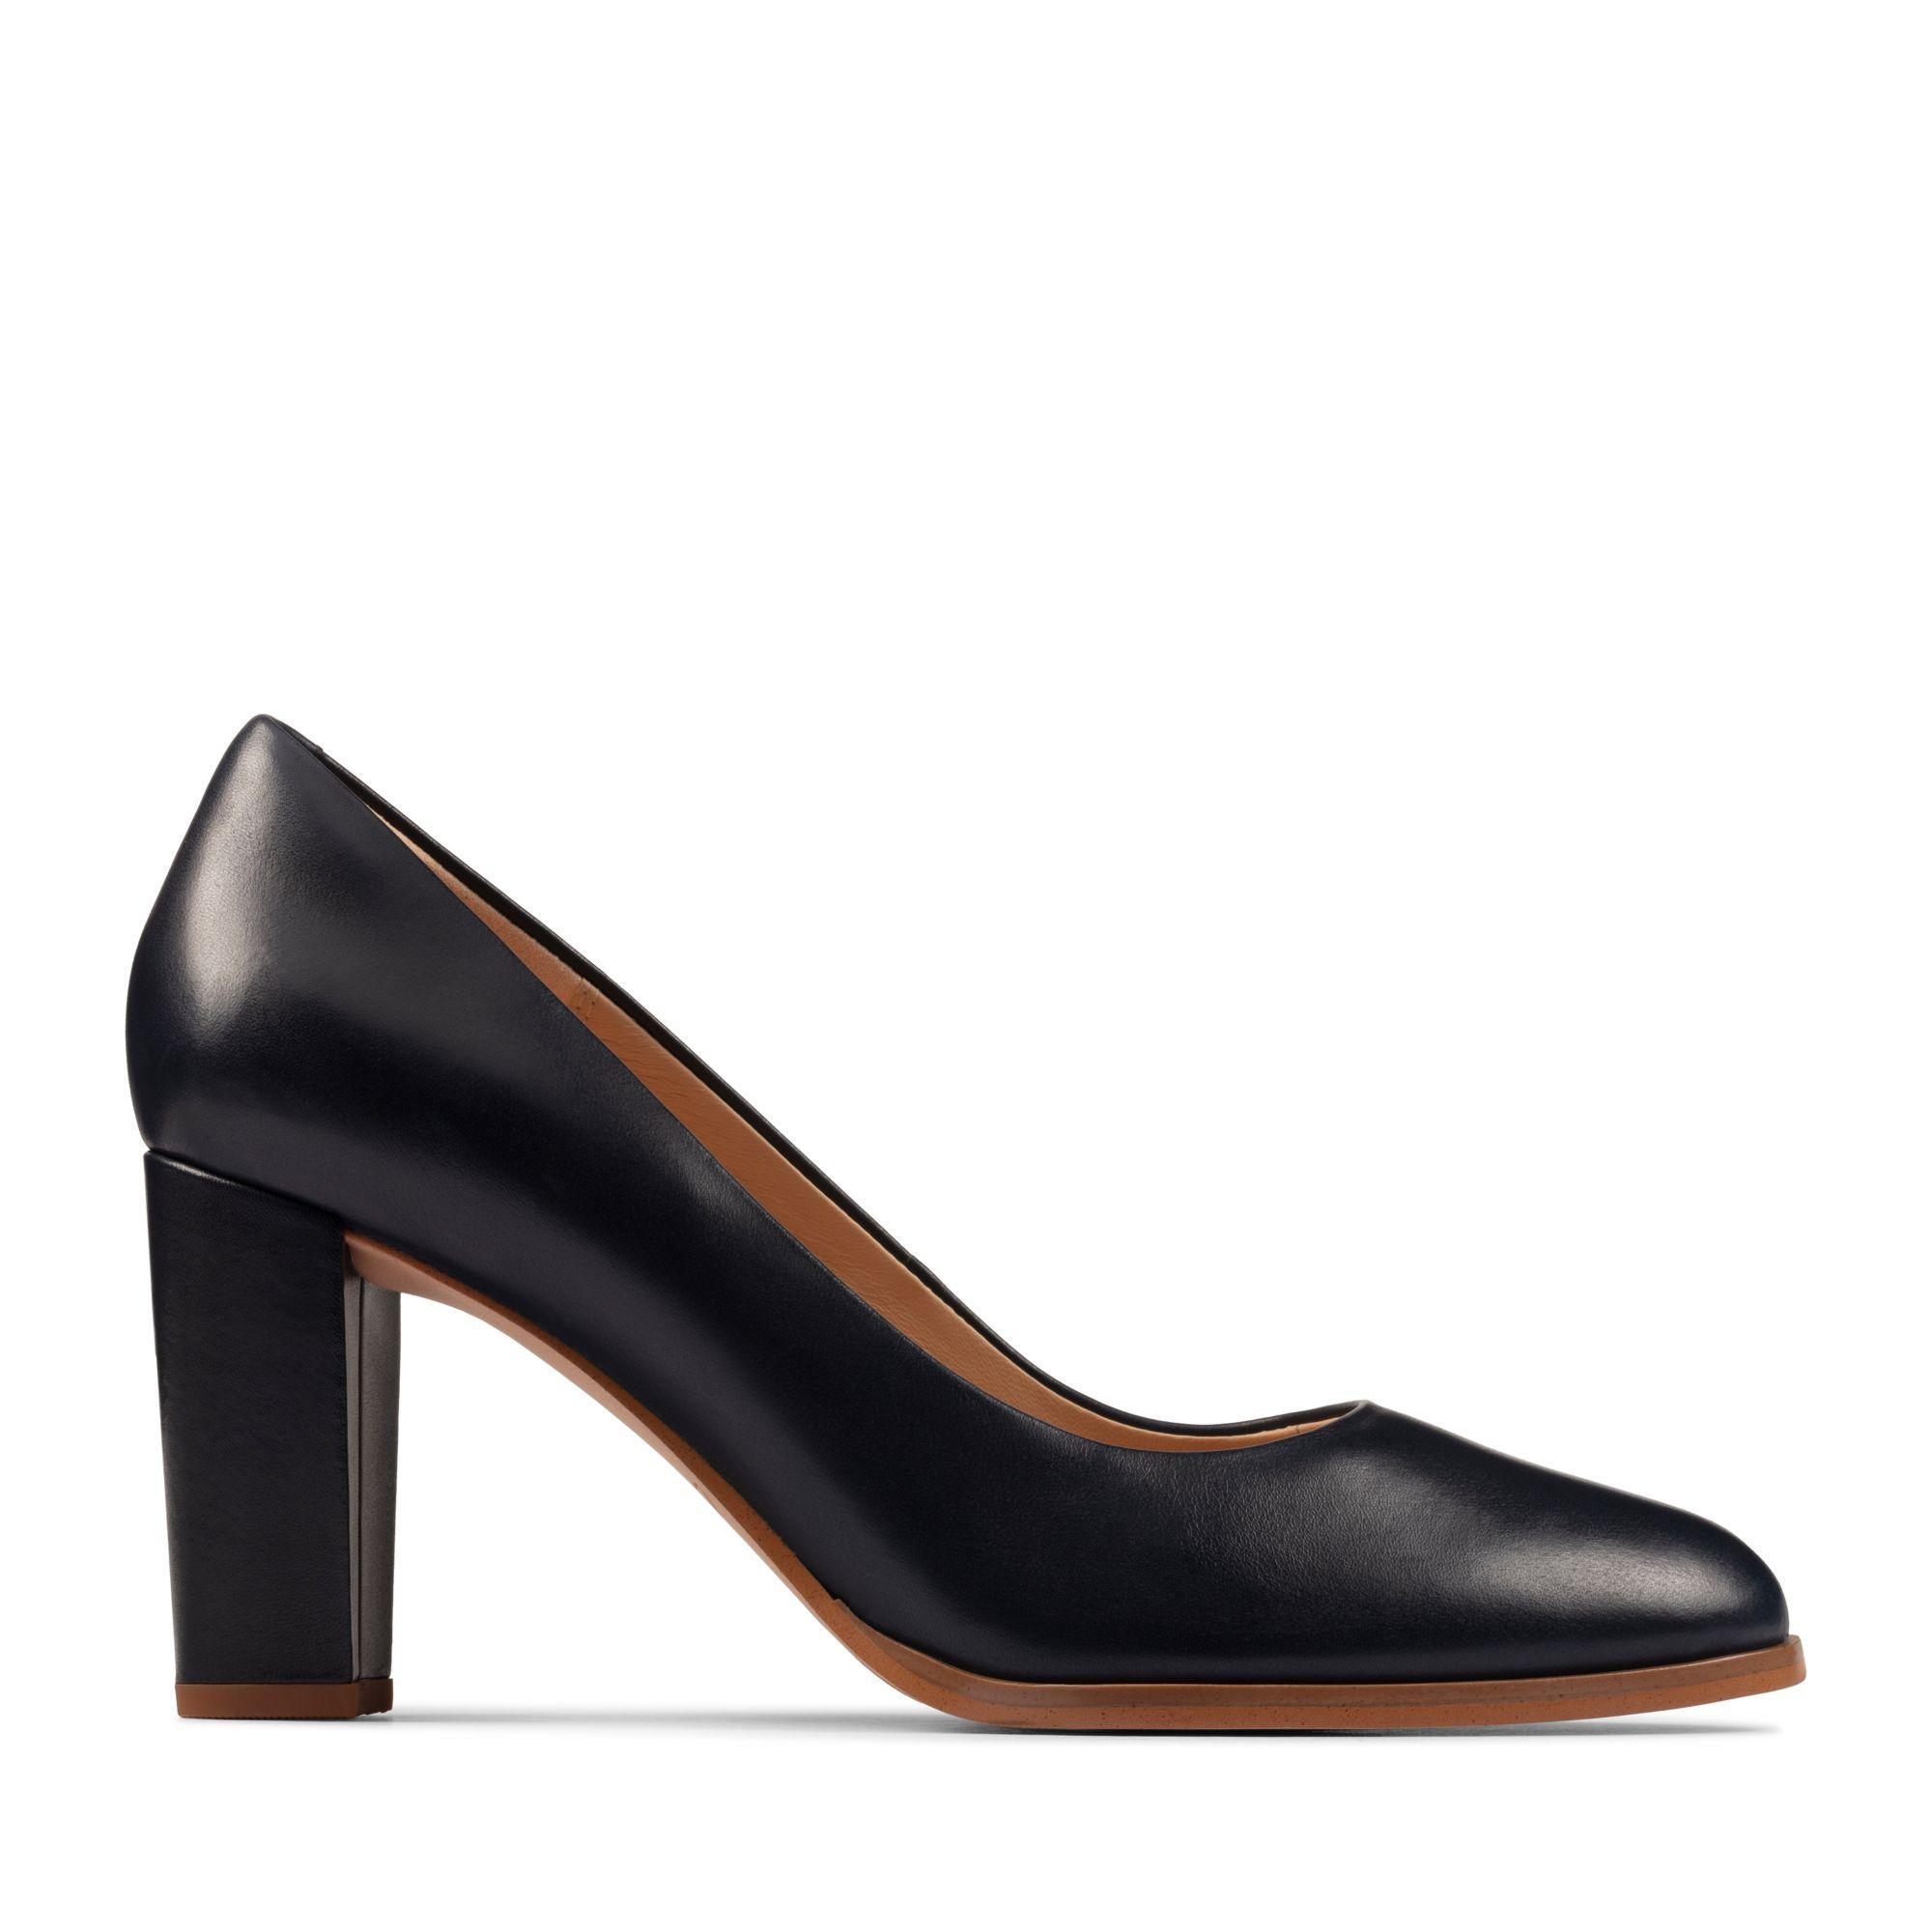 Clarks Kaylin Cara 2 – Leather